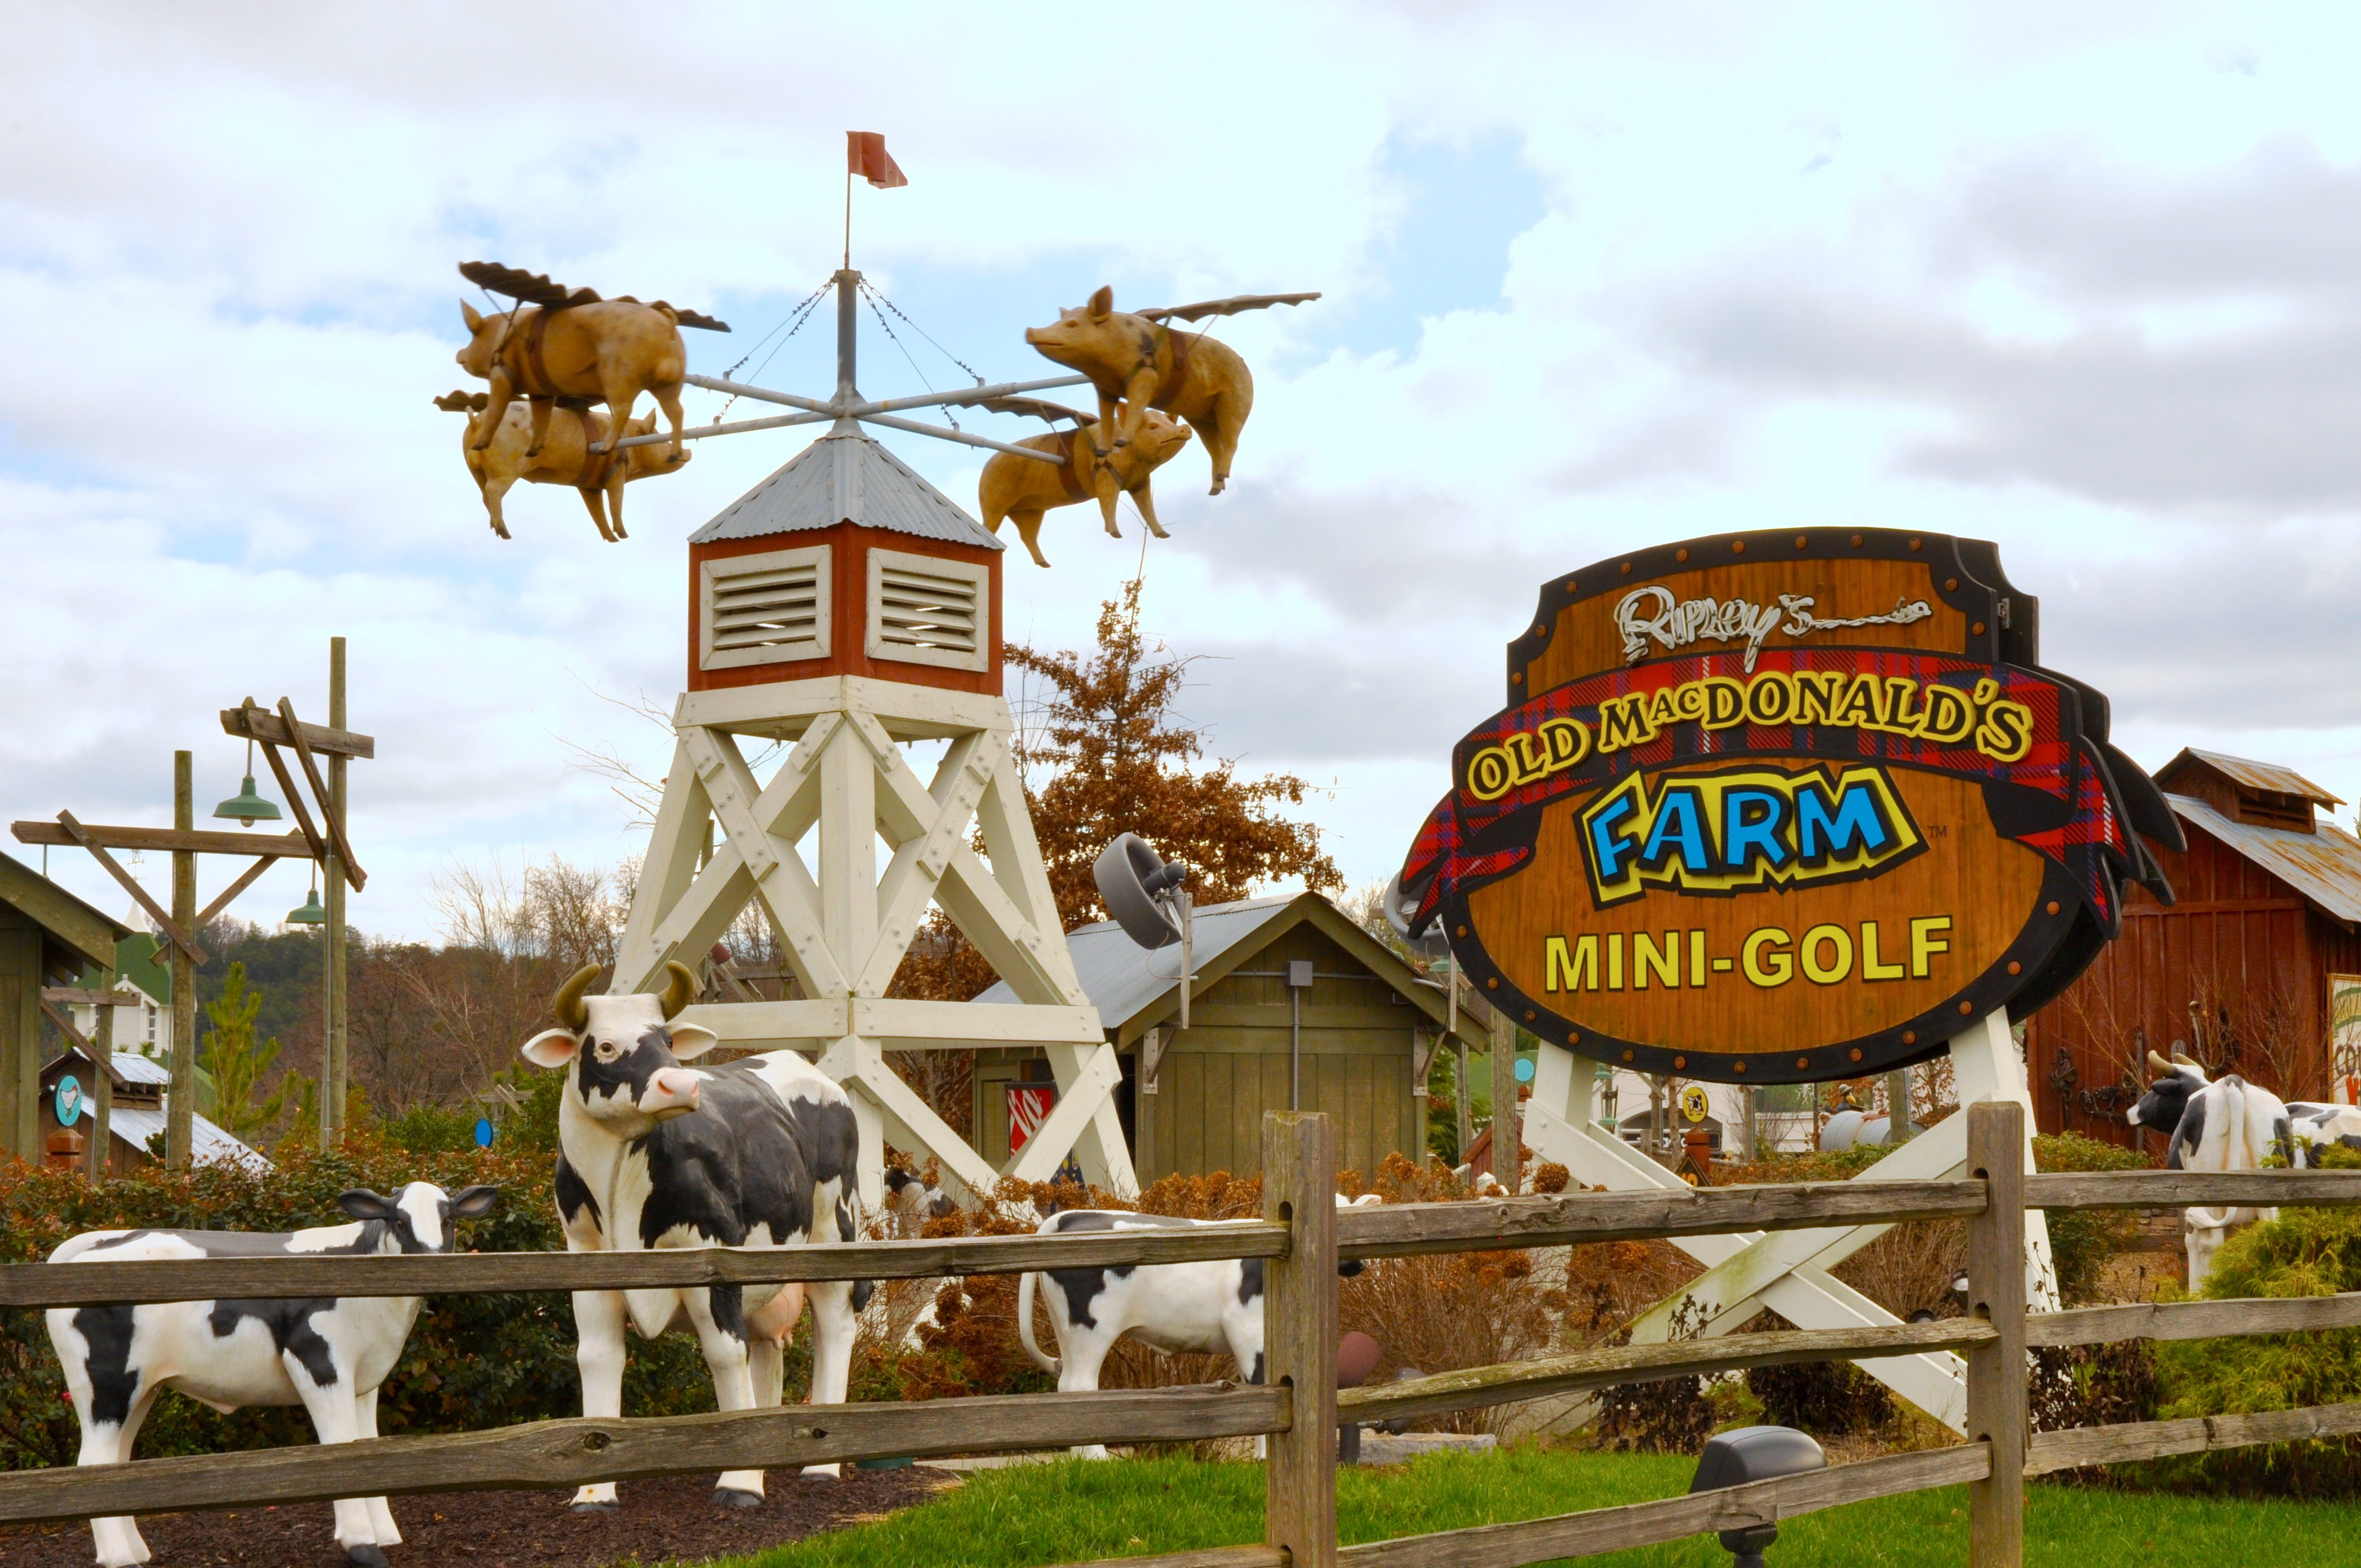 Ripley's Old MacDonald's Farm Mini-Golf | Mini golf, Gatlinburg ...